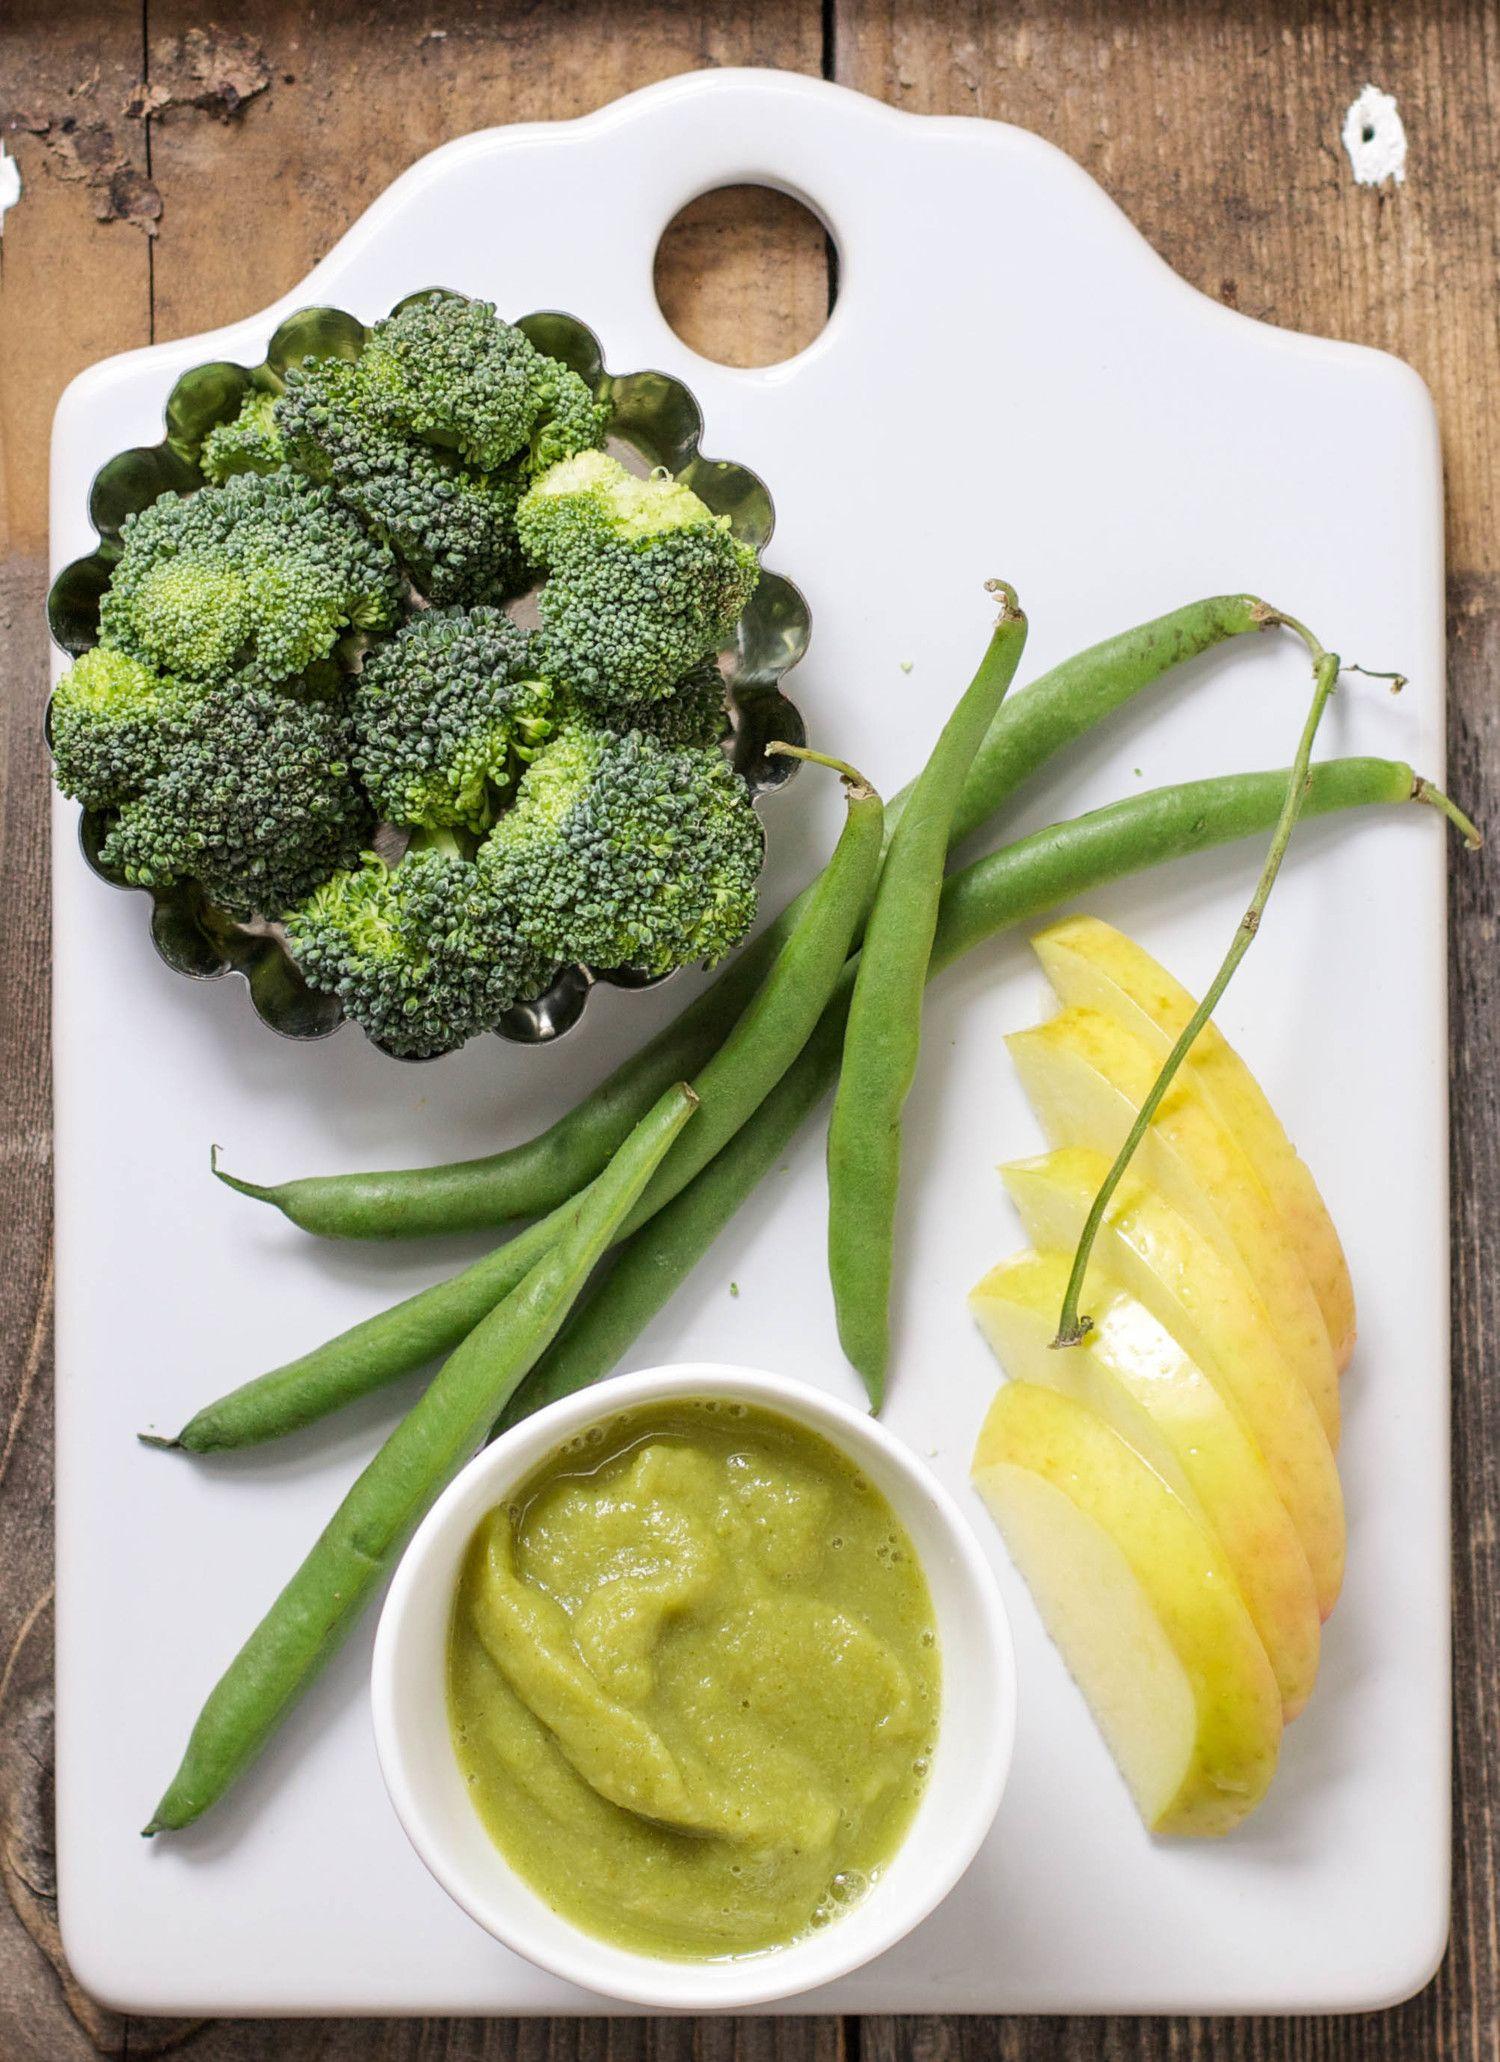 Apple Green Beans Broccoli Puree Baby Food Recipes Healthy Baby Food Baby Broccoli Recipe